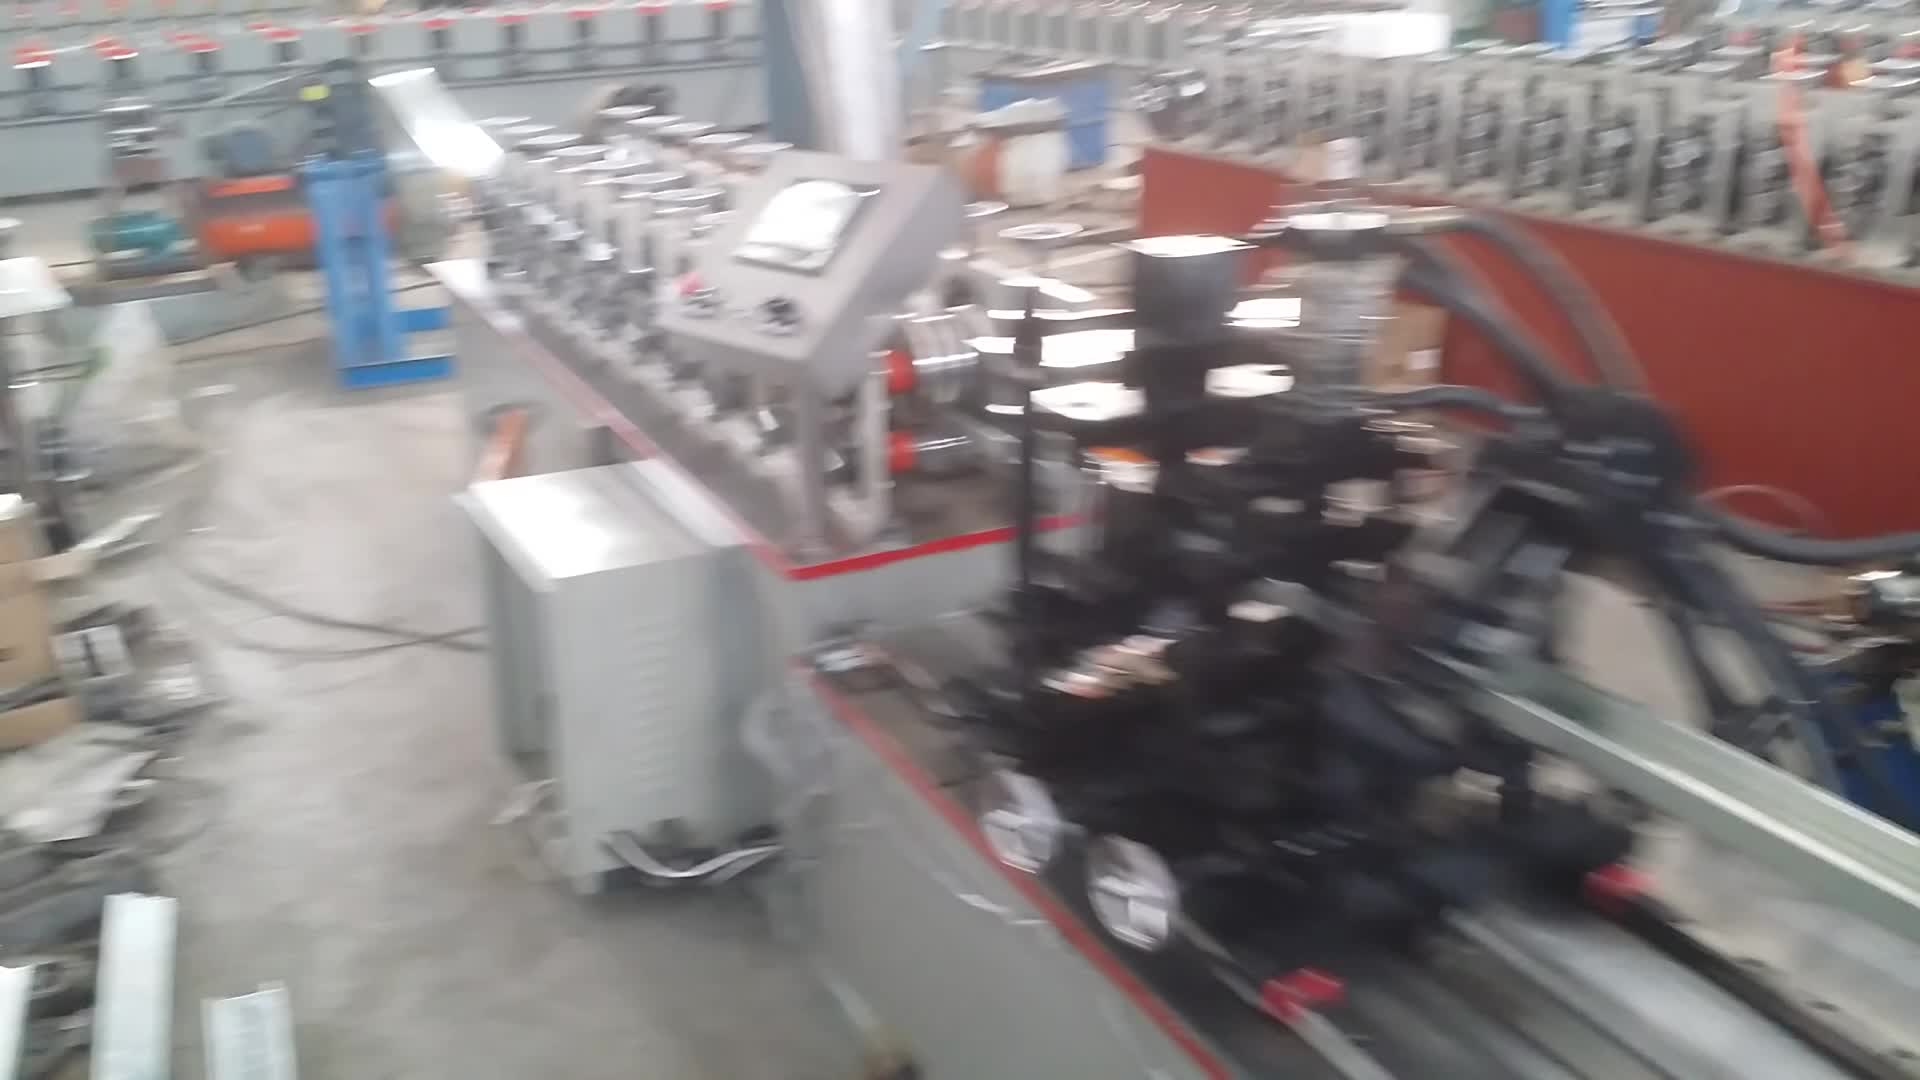 Light Keel And Stud Sheet Steel Drywall Profile Forming Machine Light Steel Keel Roll Forming Machine